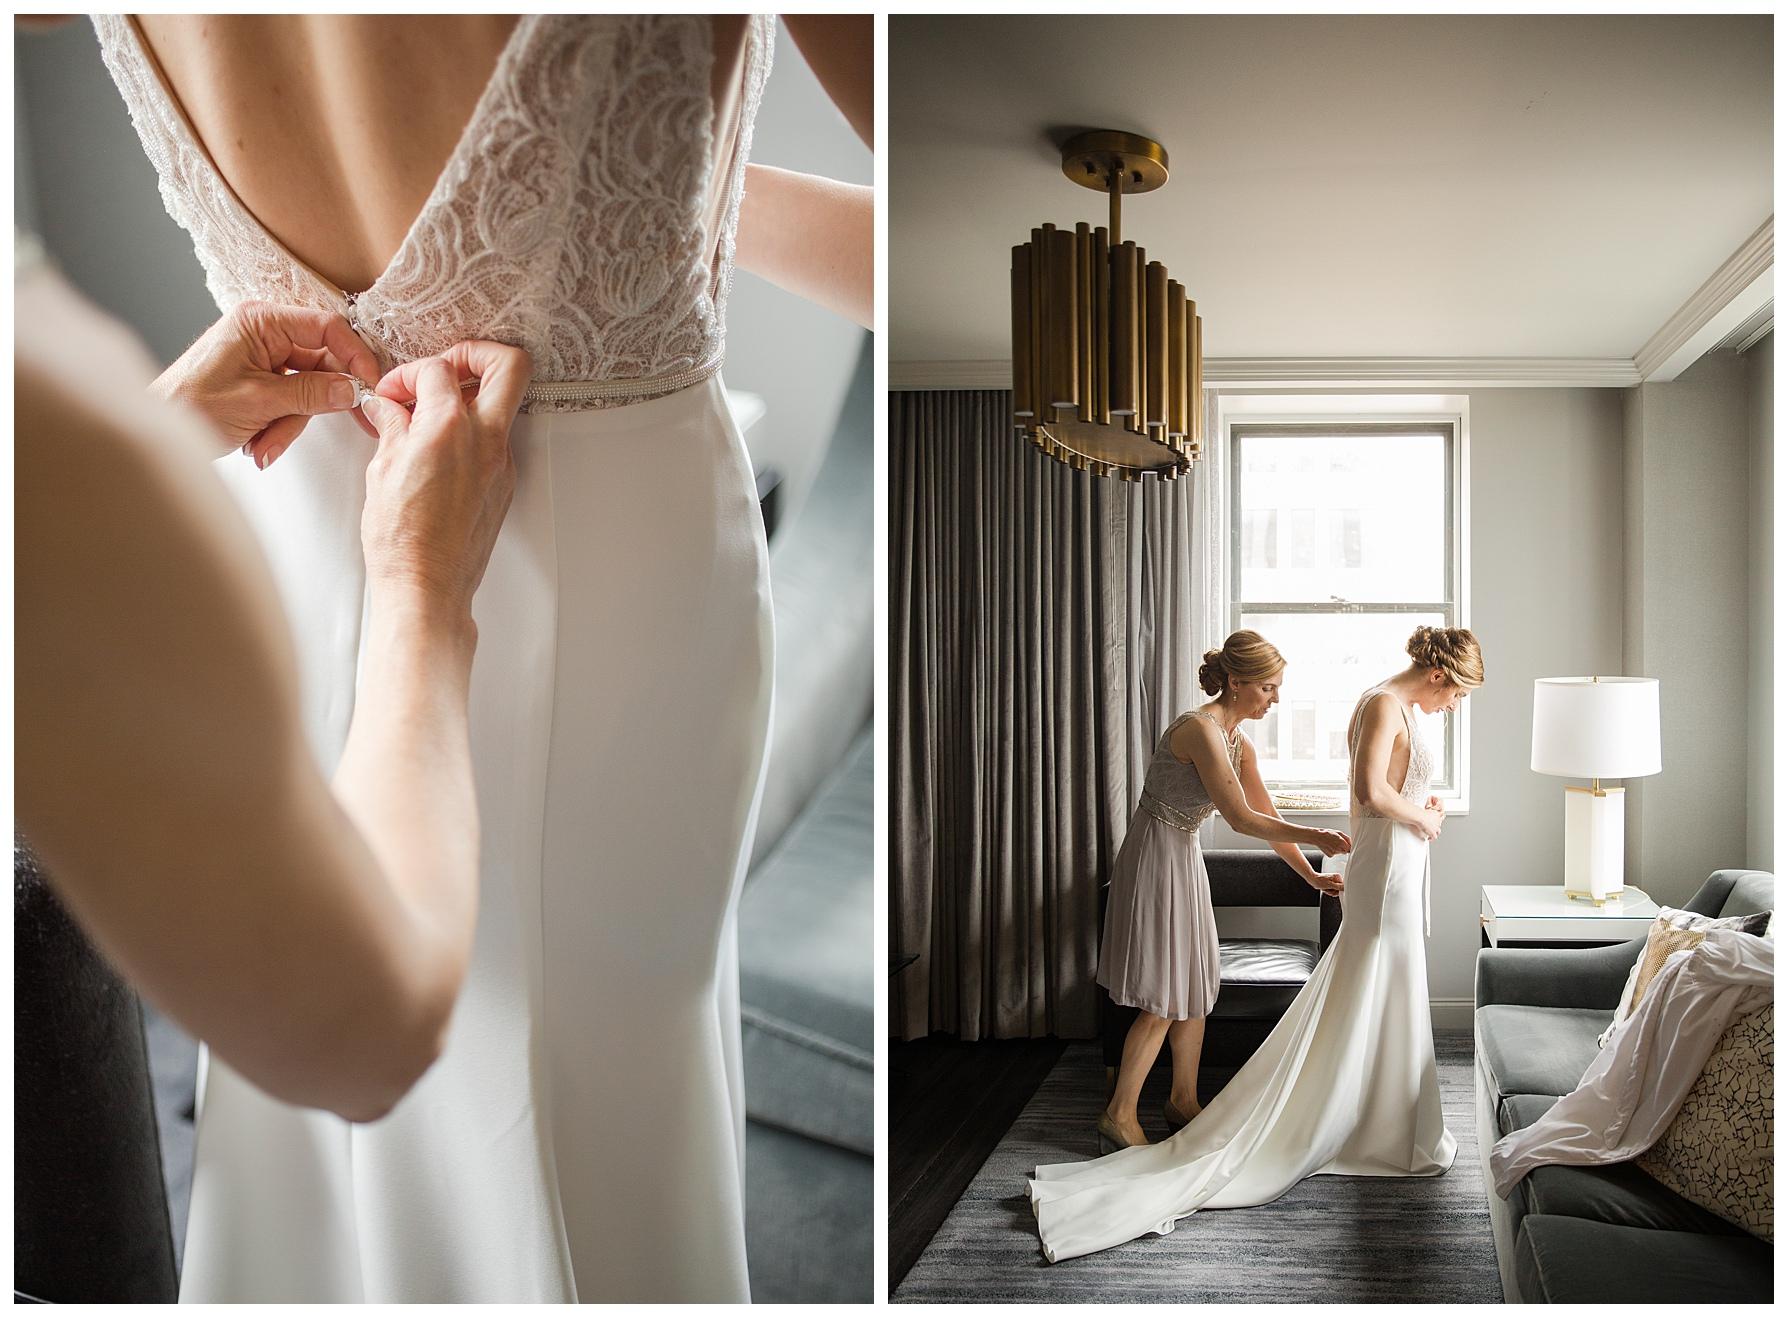 hotel-LeVeque-autograph-collection-columbus-wedding_0007.jpg